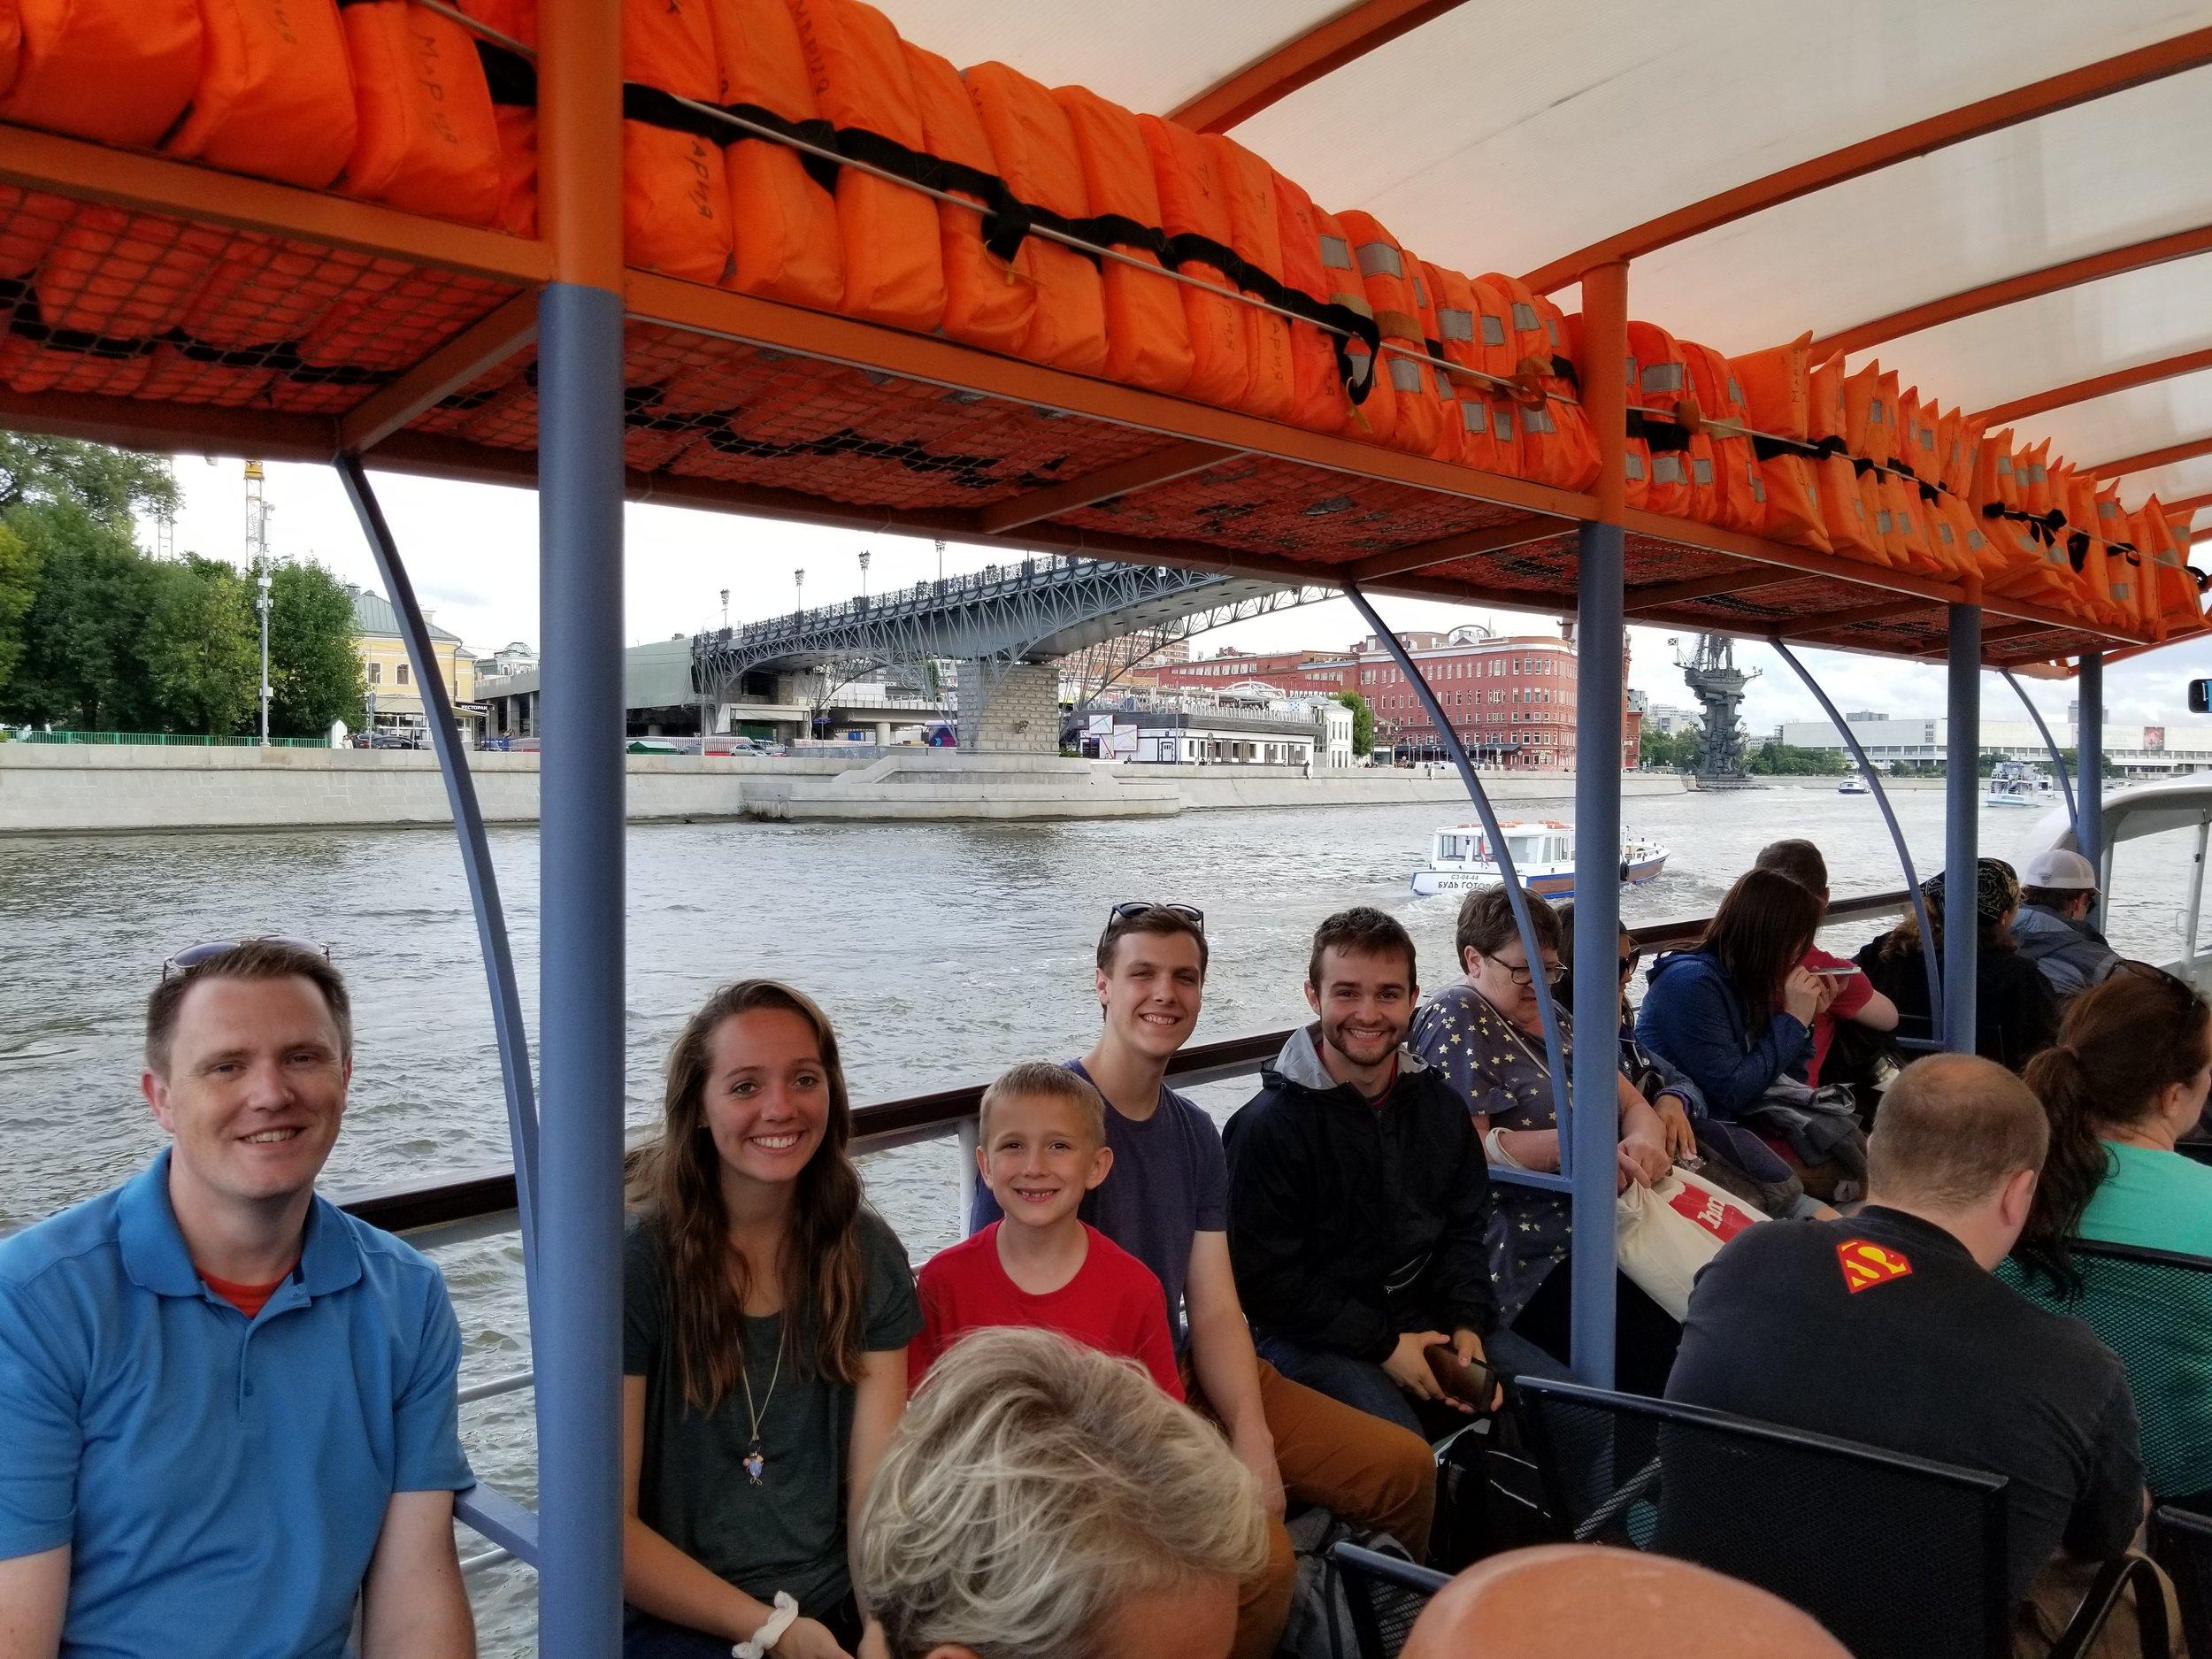 Enjoying a river tour through the city